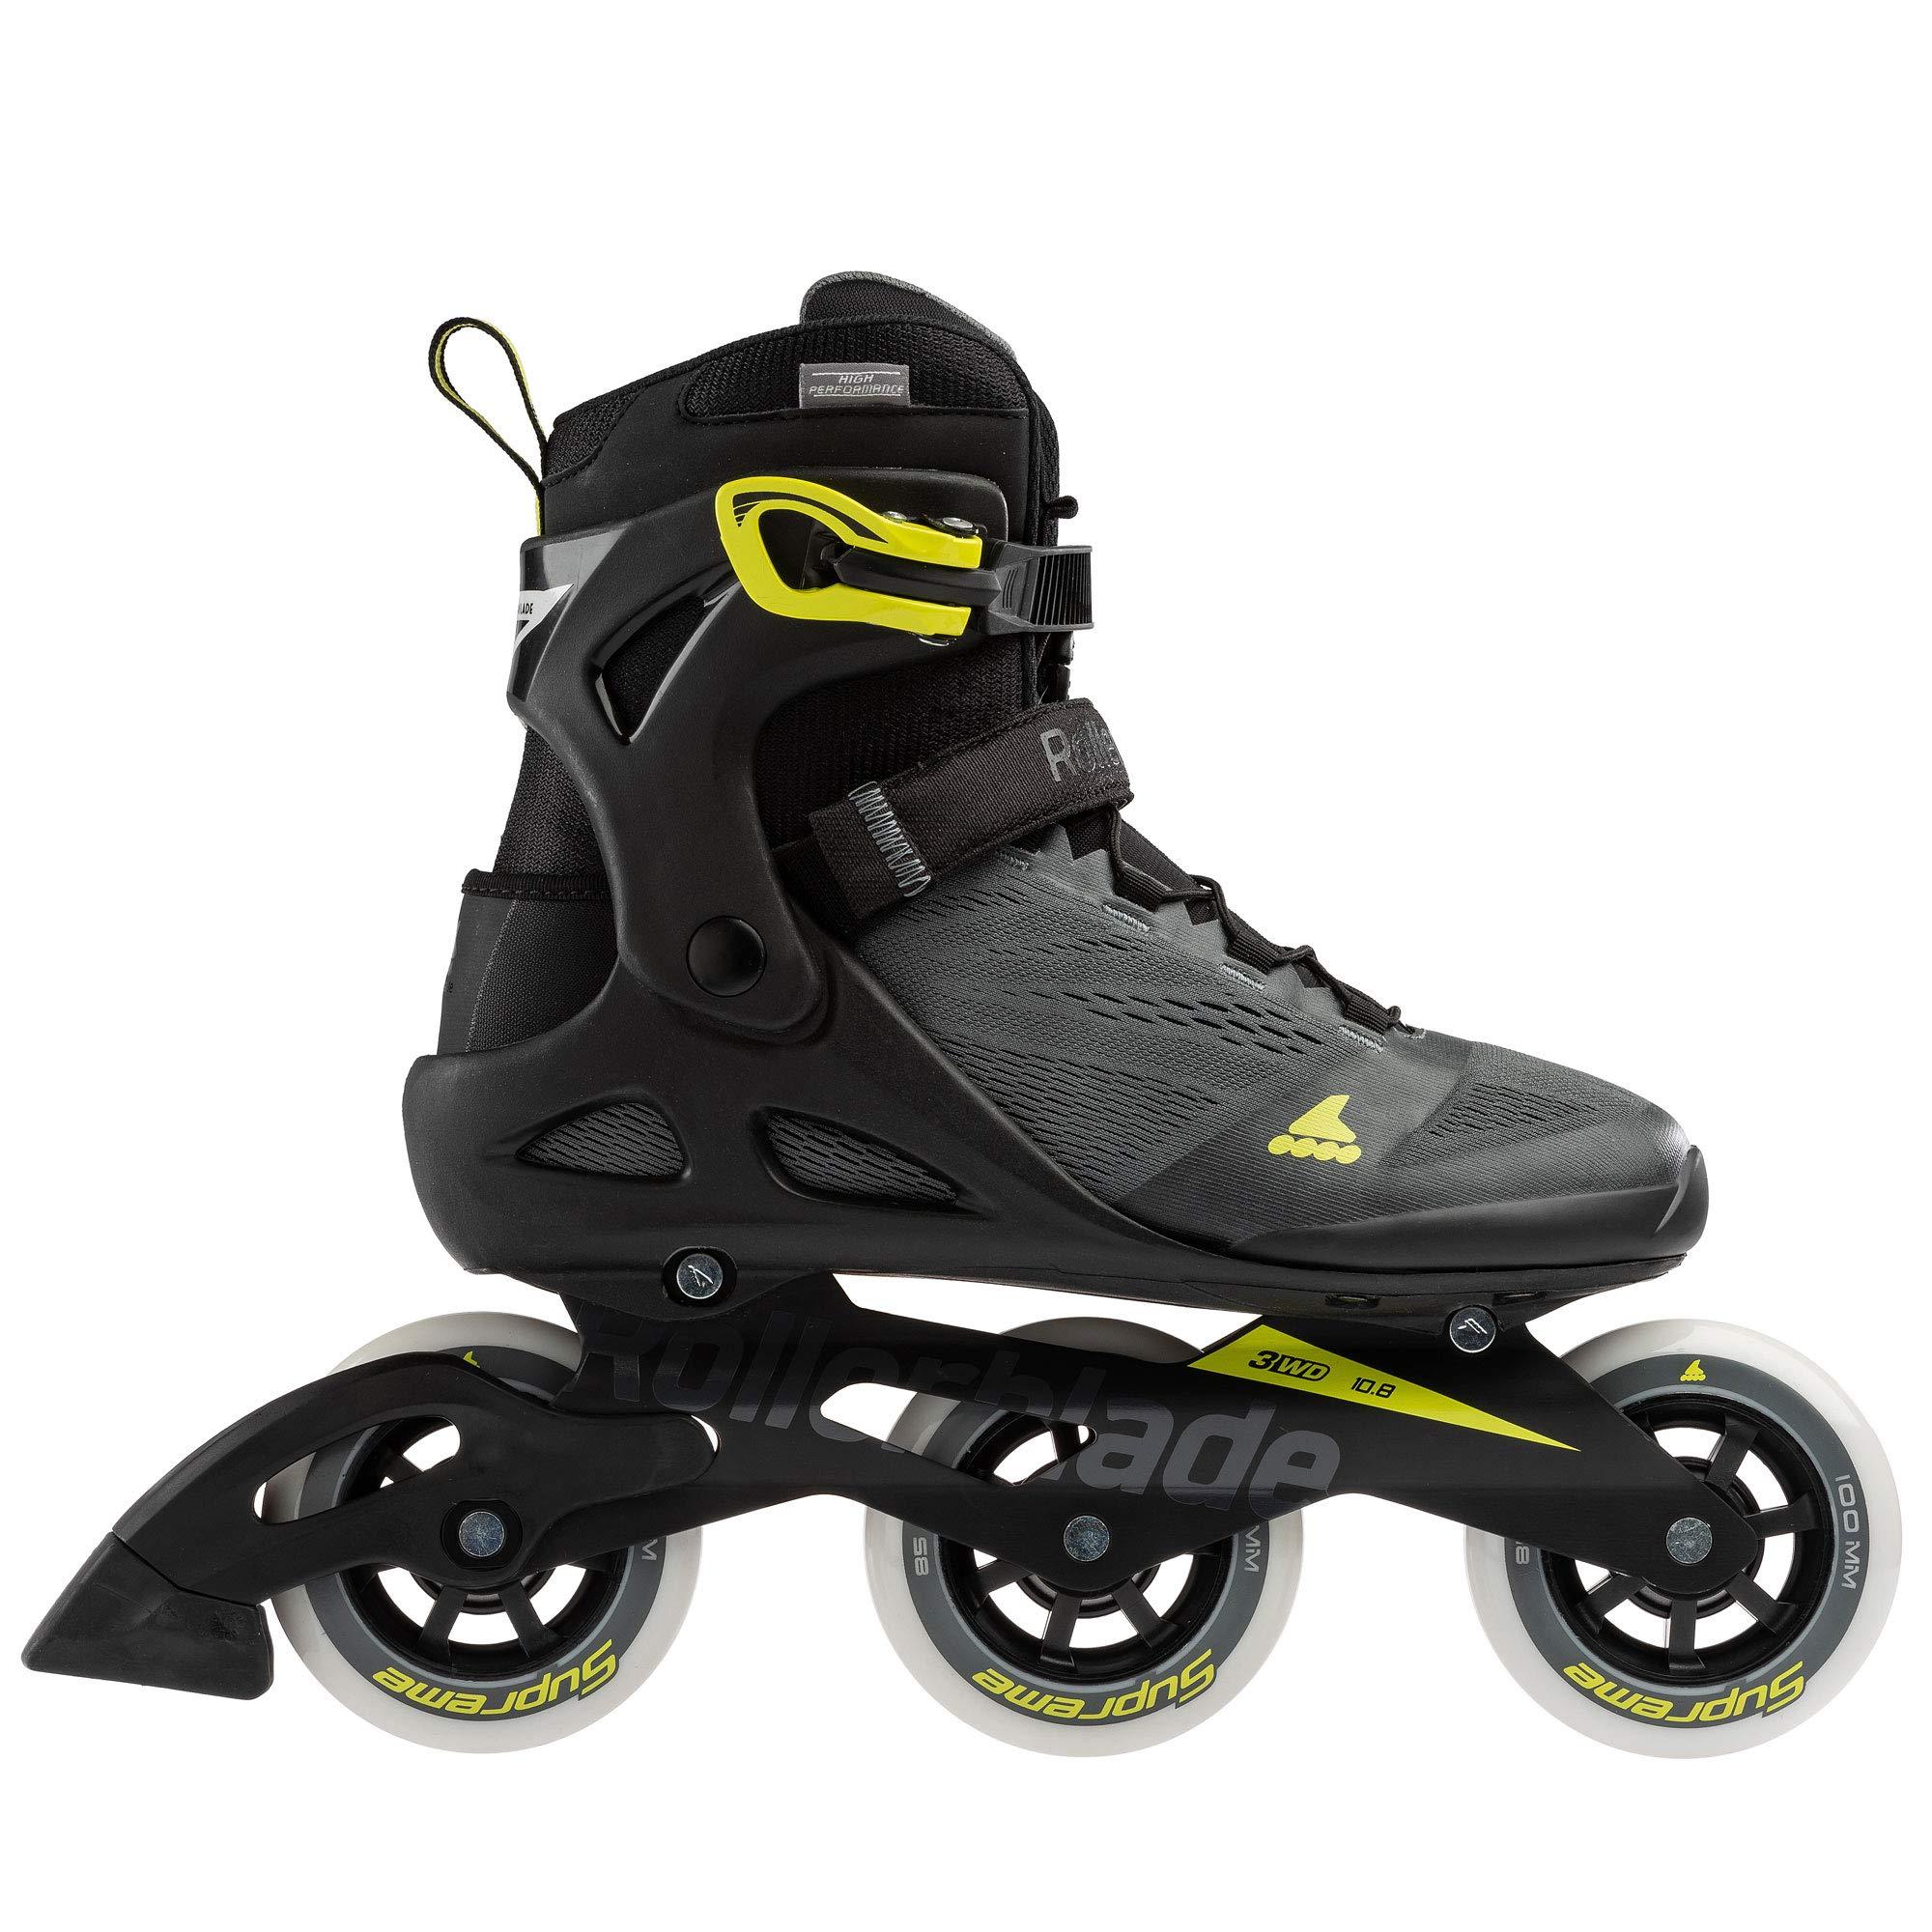 Rollerblade Macroblade 100 3Wd Men's Adult Fitness Inline Skate, Anthracite/Neon Yellow, Medium 9.5